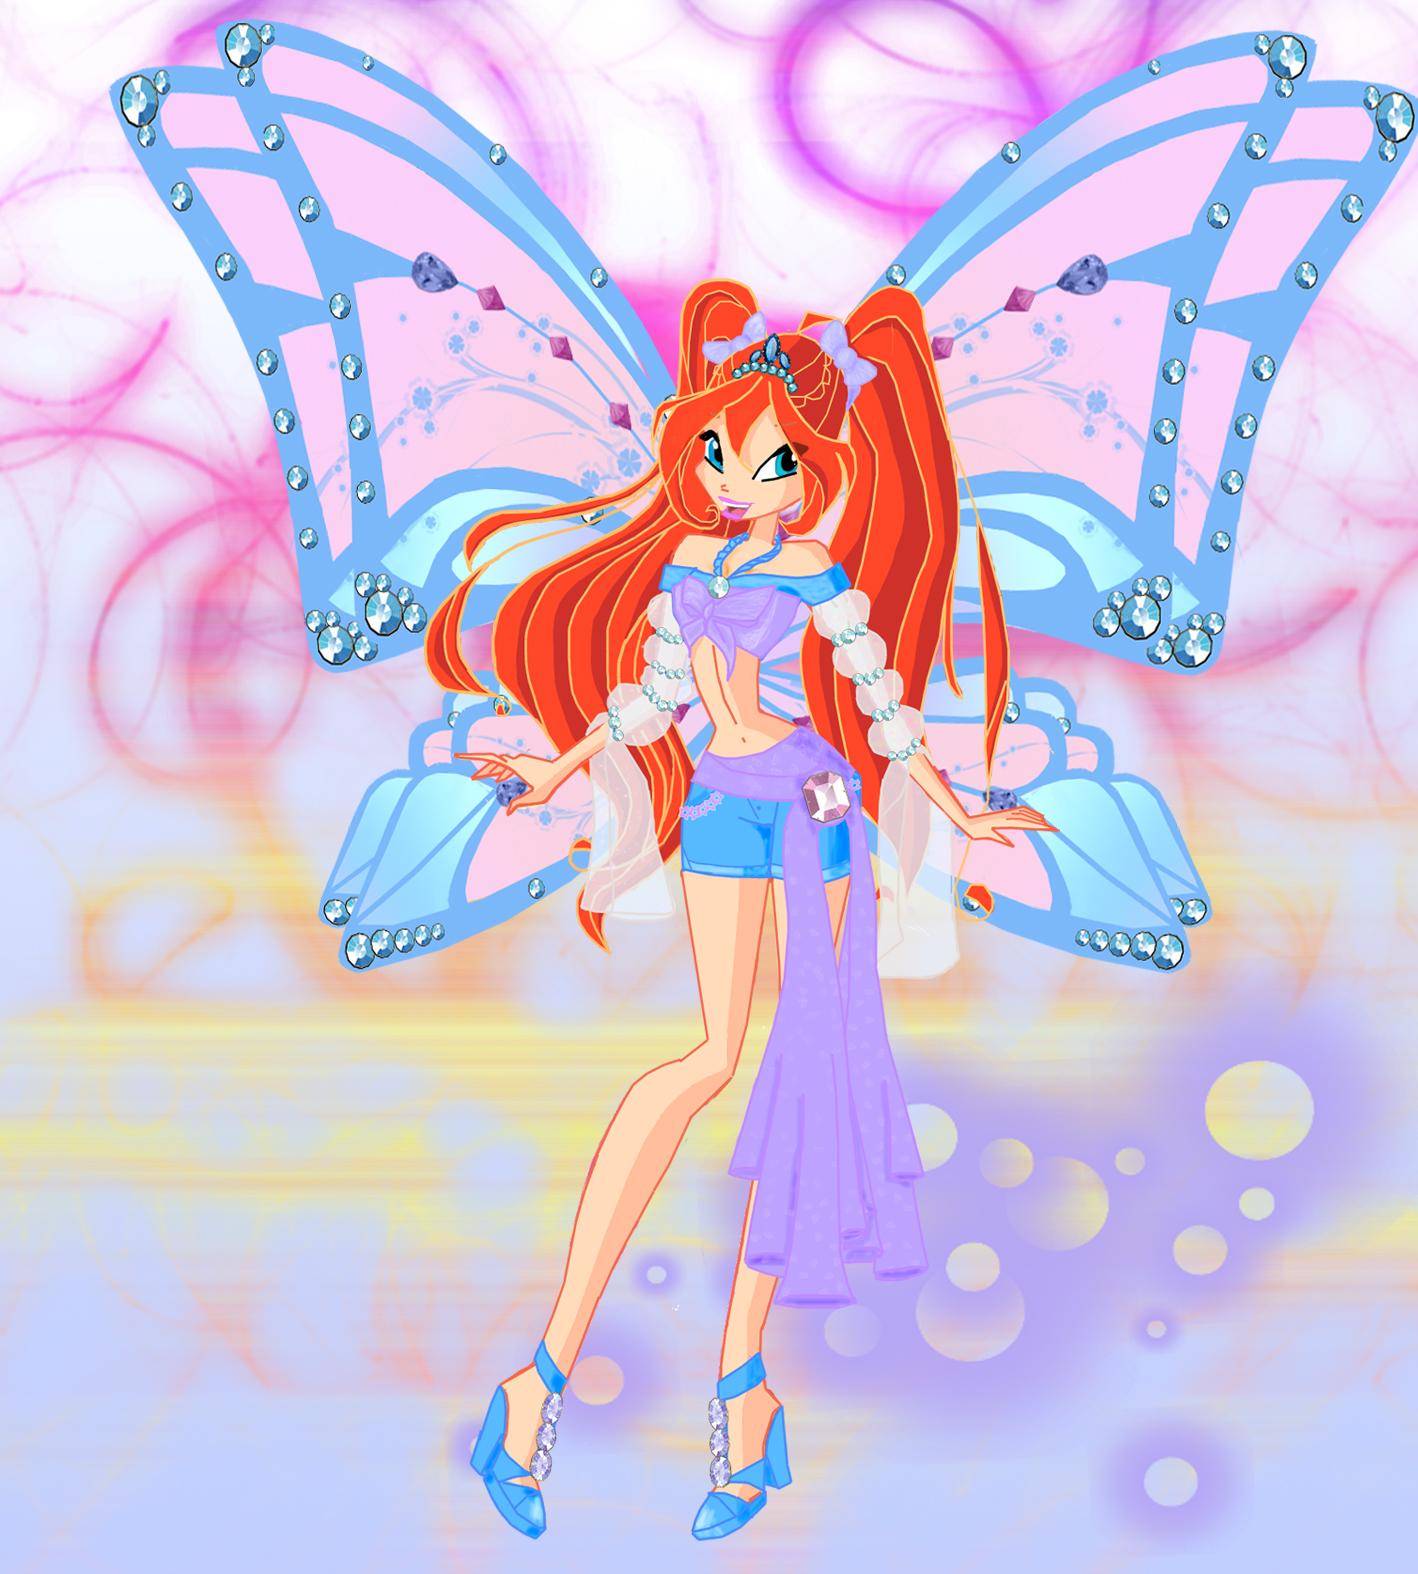 http://3.bp.blogspot.com/-edAqm9ln9Jk/UUTFWGDZD3I/AAAAAAAAx-k/qF9R5KKBuLk/s1600/bloom_by_winx_club_by_girlfromfairytale-d38payt.jpg